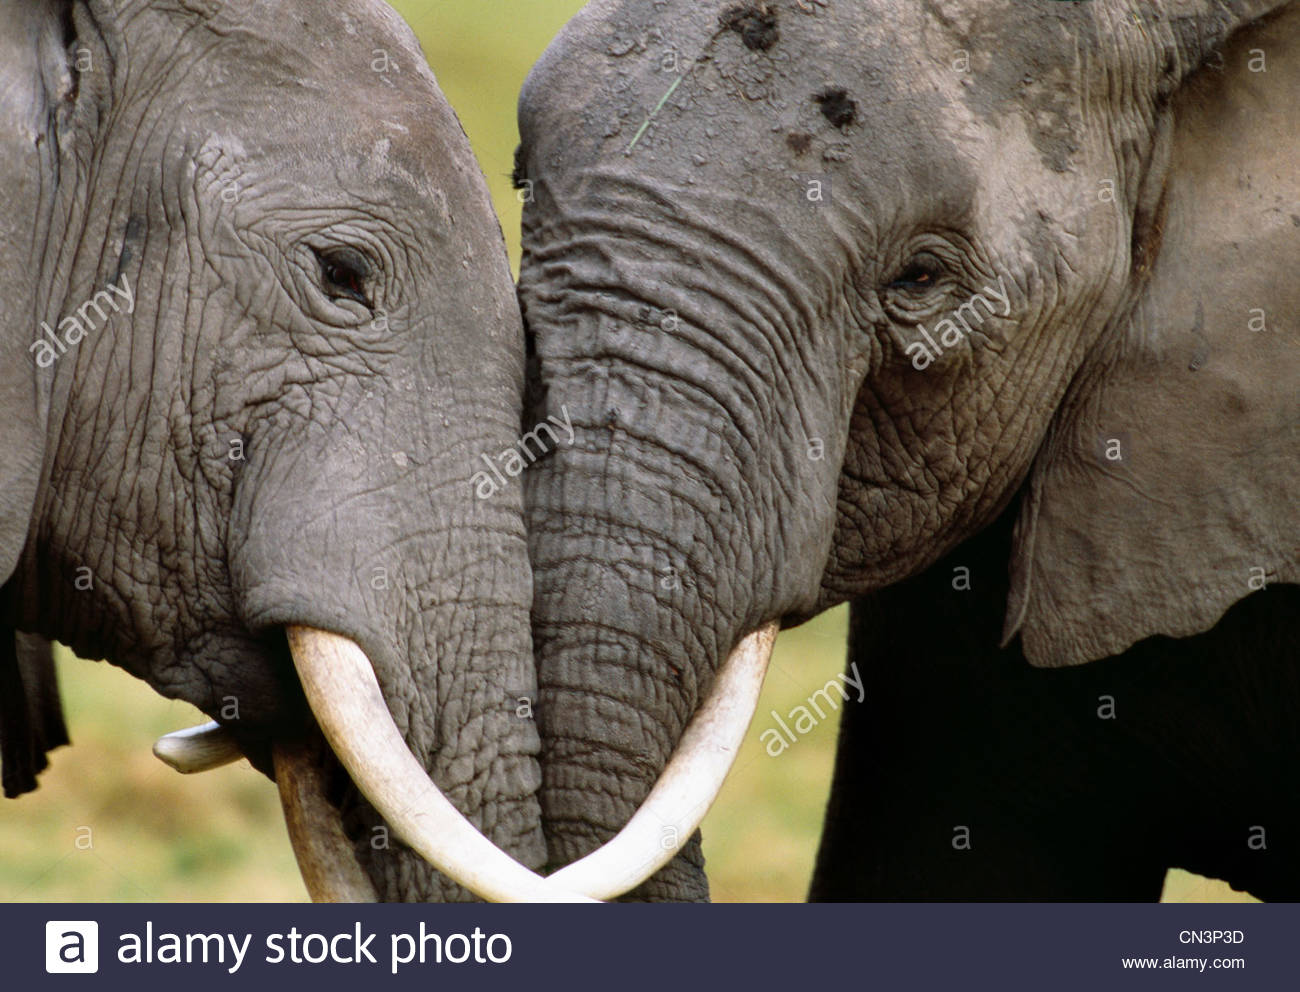 Afrikanische Elefanten, Geselligkeit, Amboseli Nationalpark, Kenia Stockbild